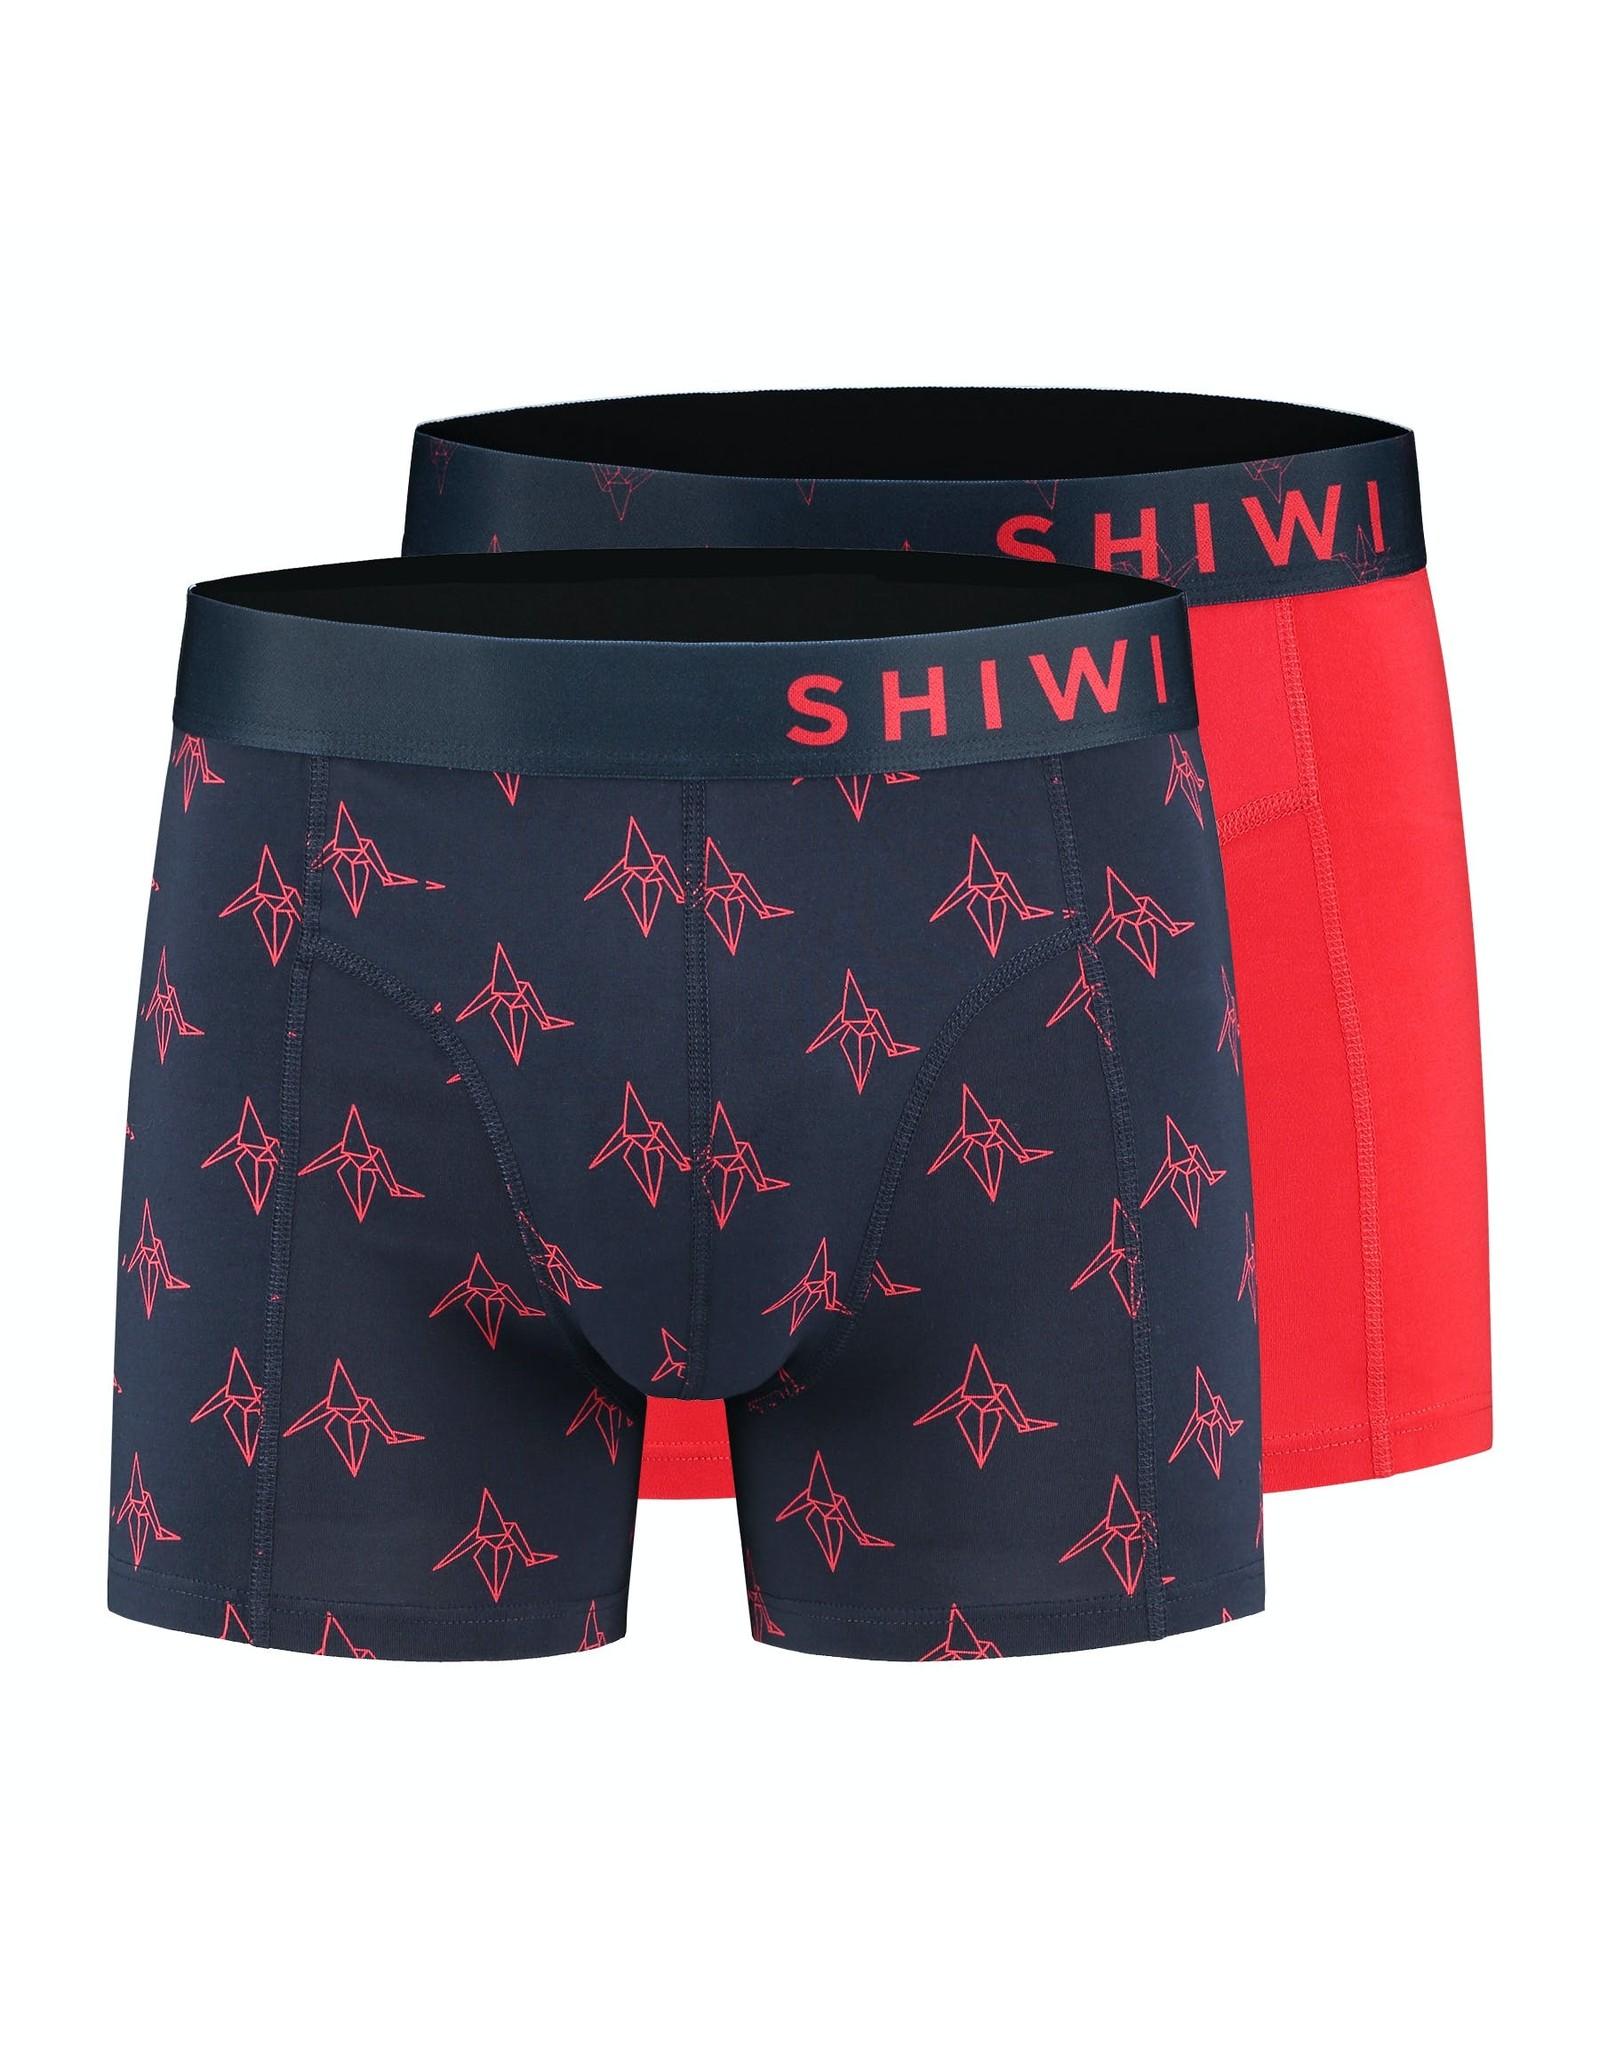 Shiwi Heren Boxershort origami